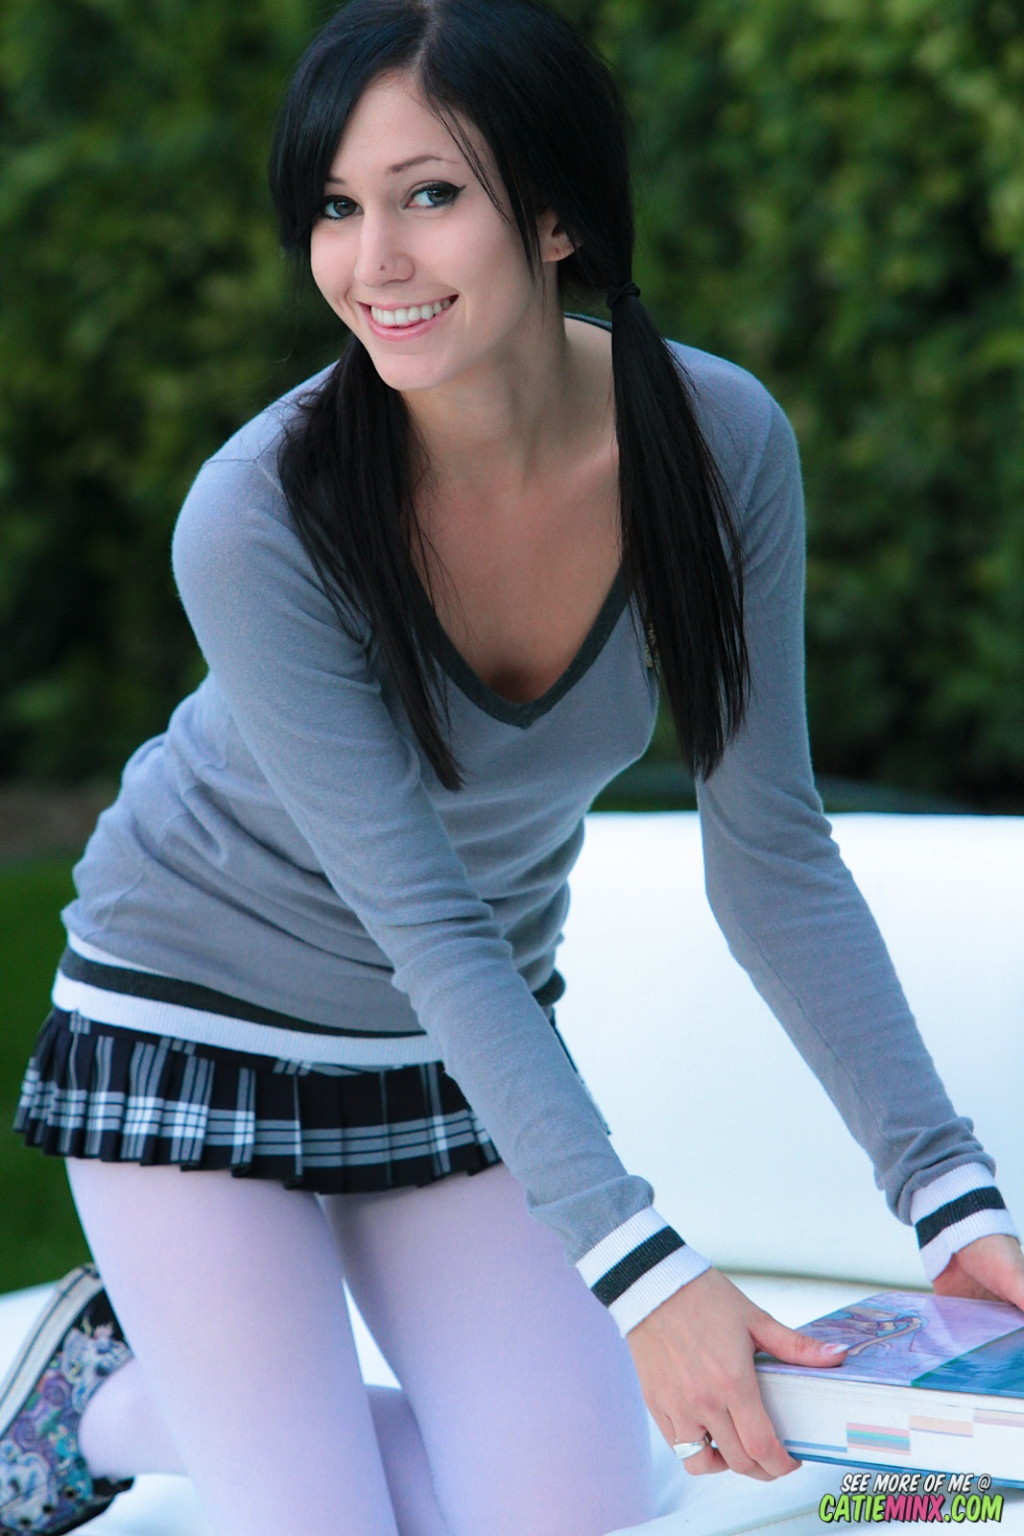 schoolgirl catie minx in nylon stockings flashing outdoors at